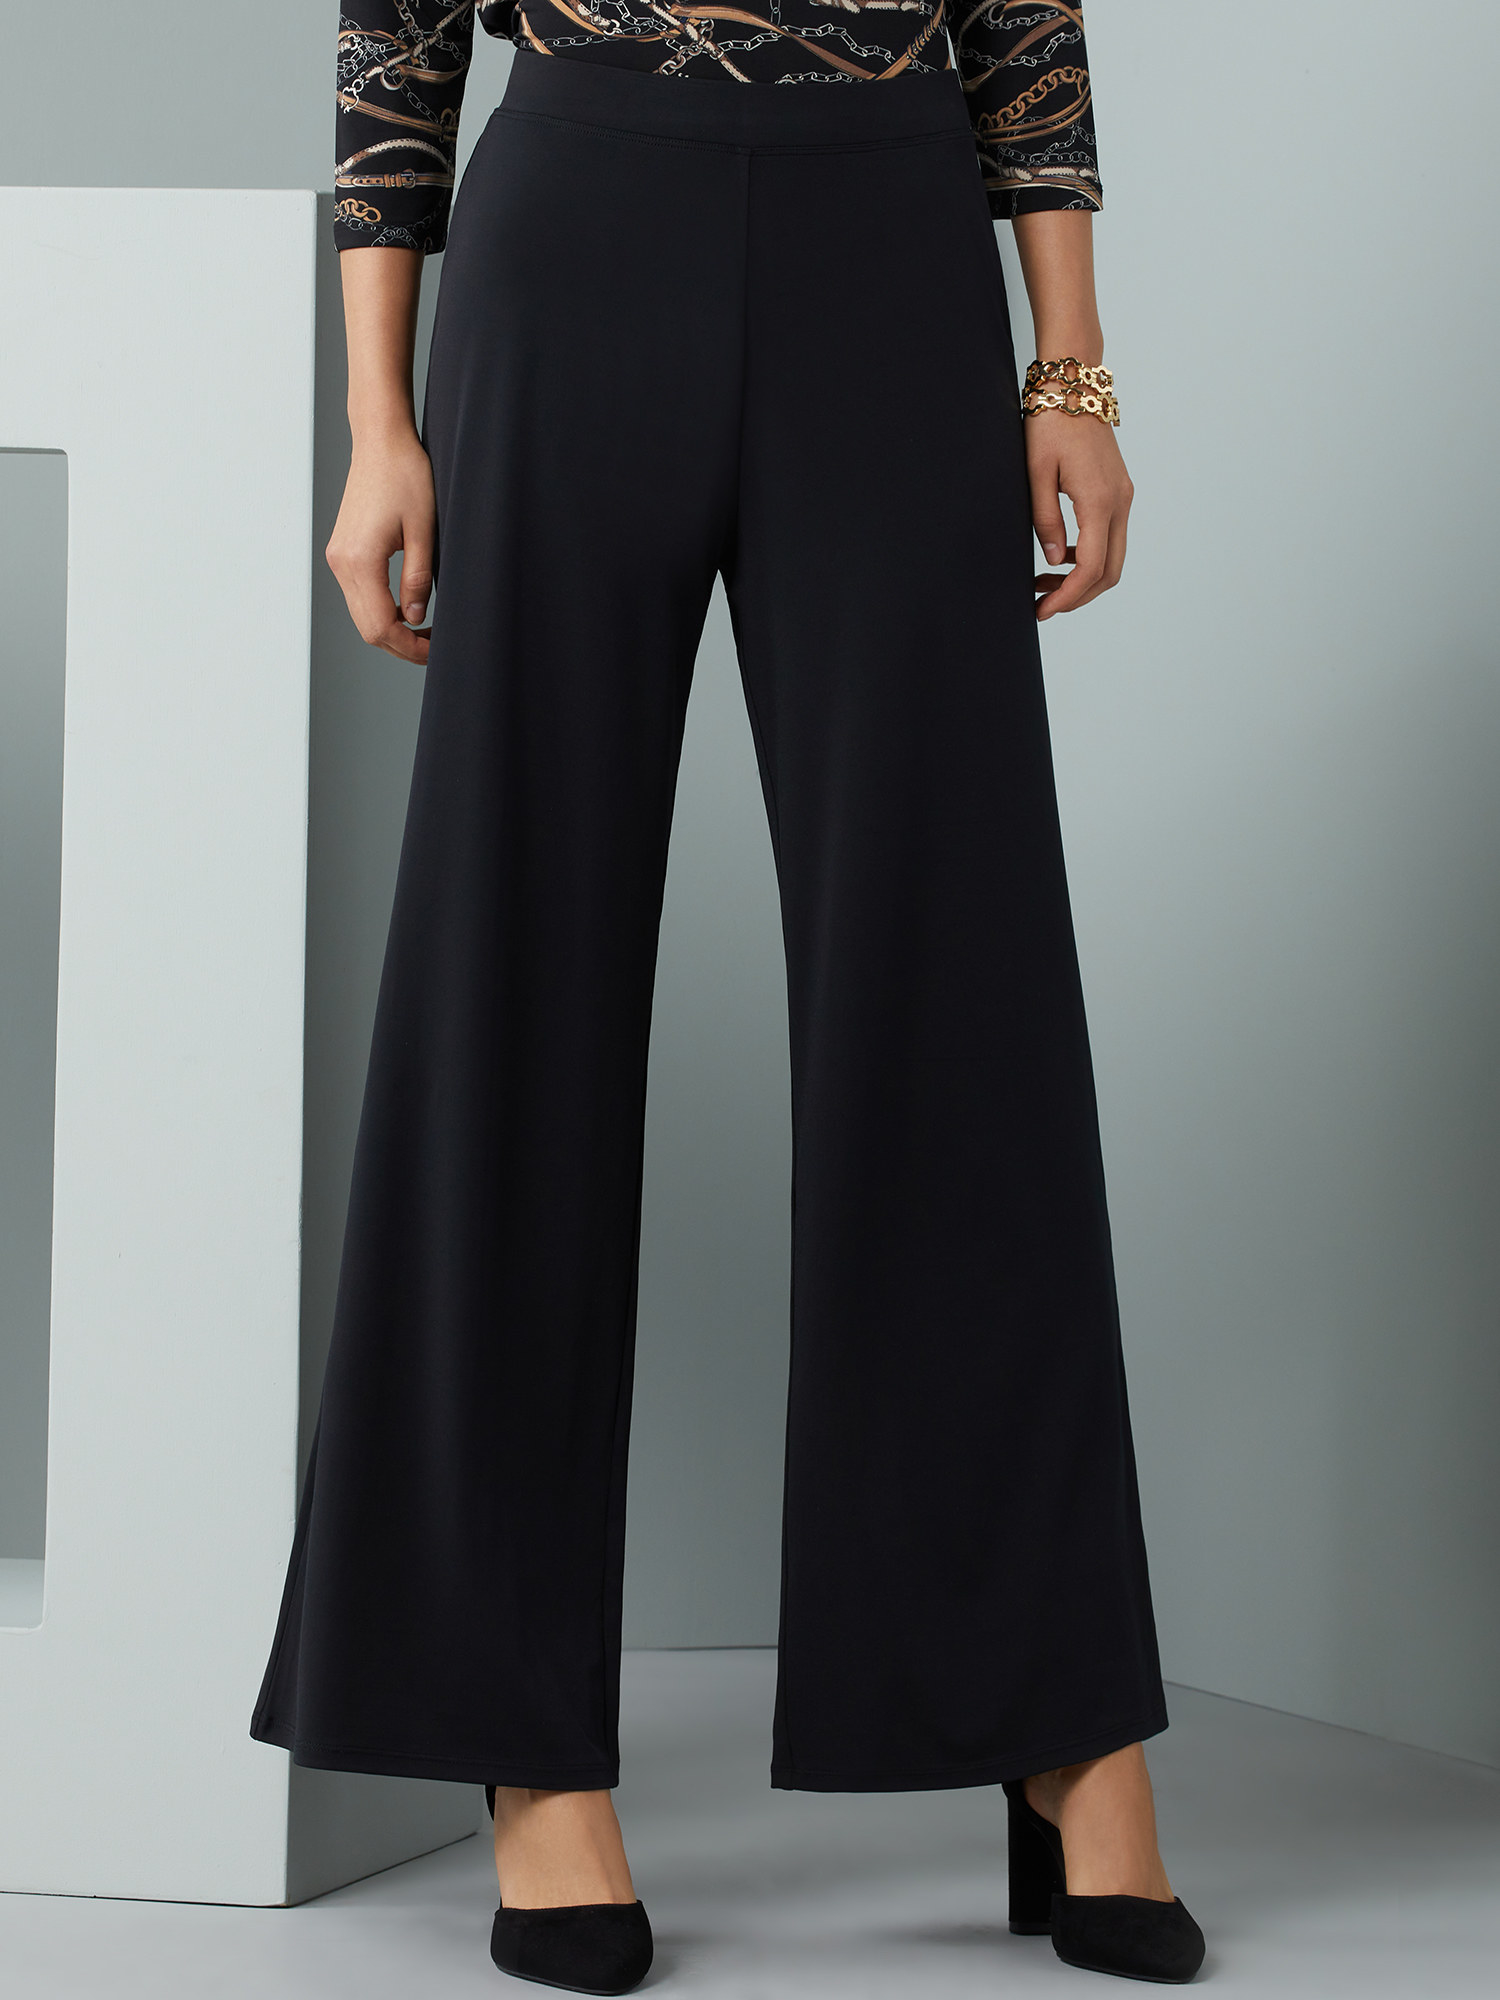 The black wide-leg pants